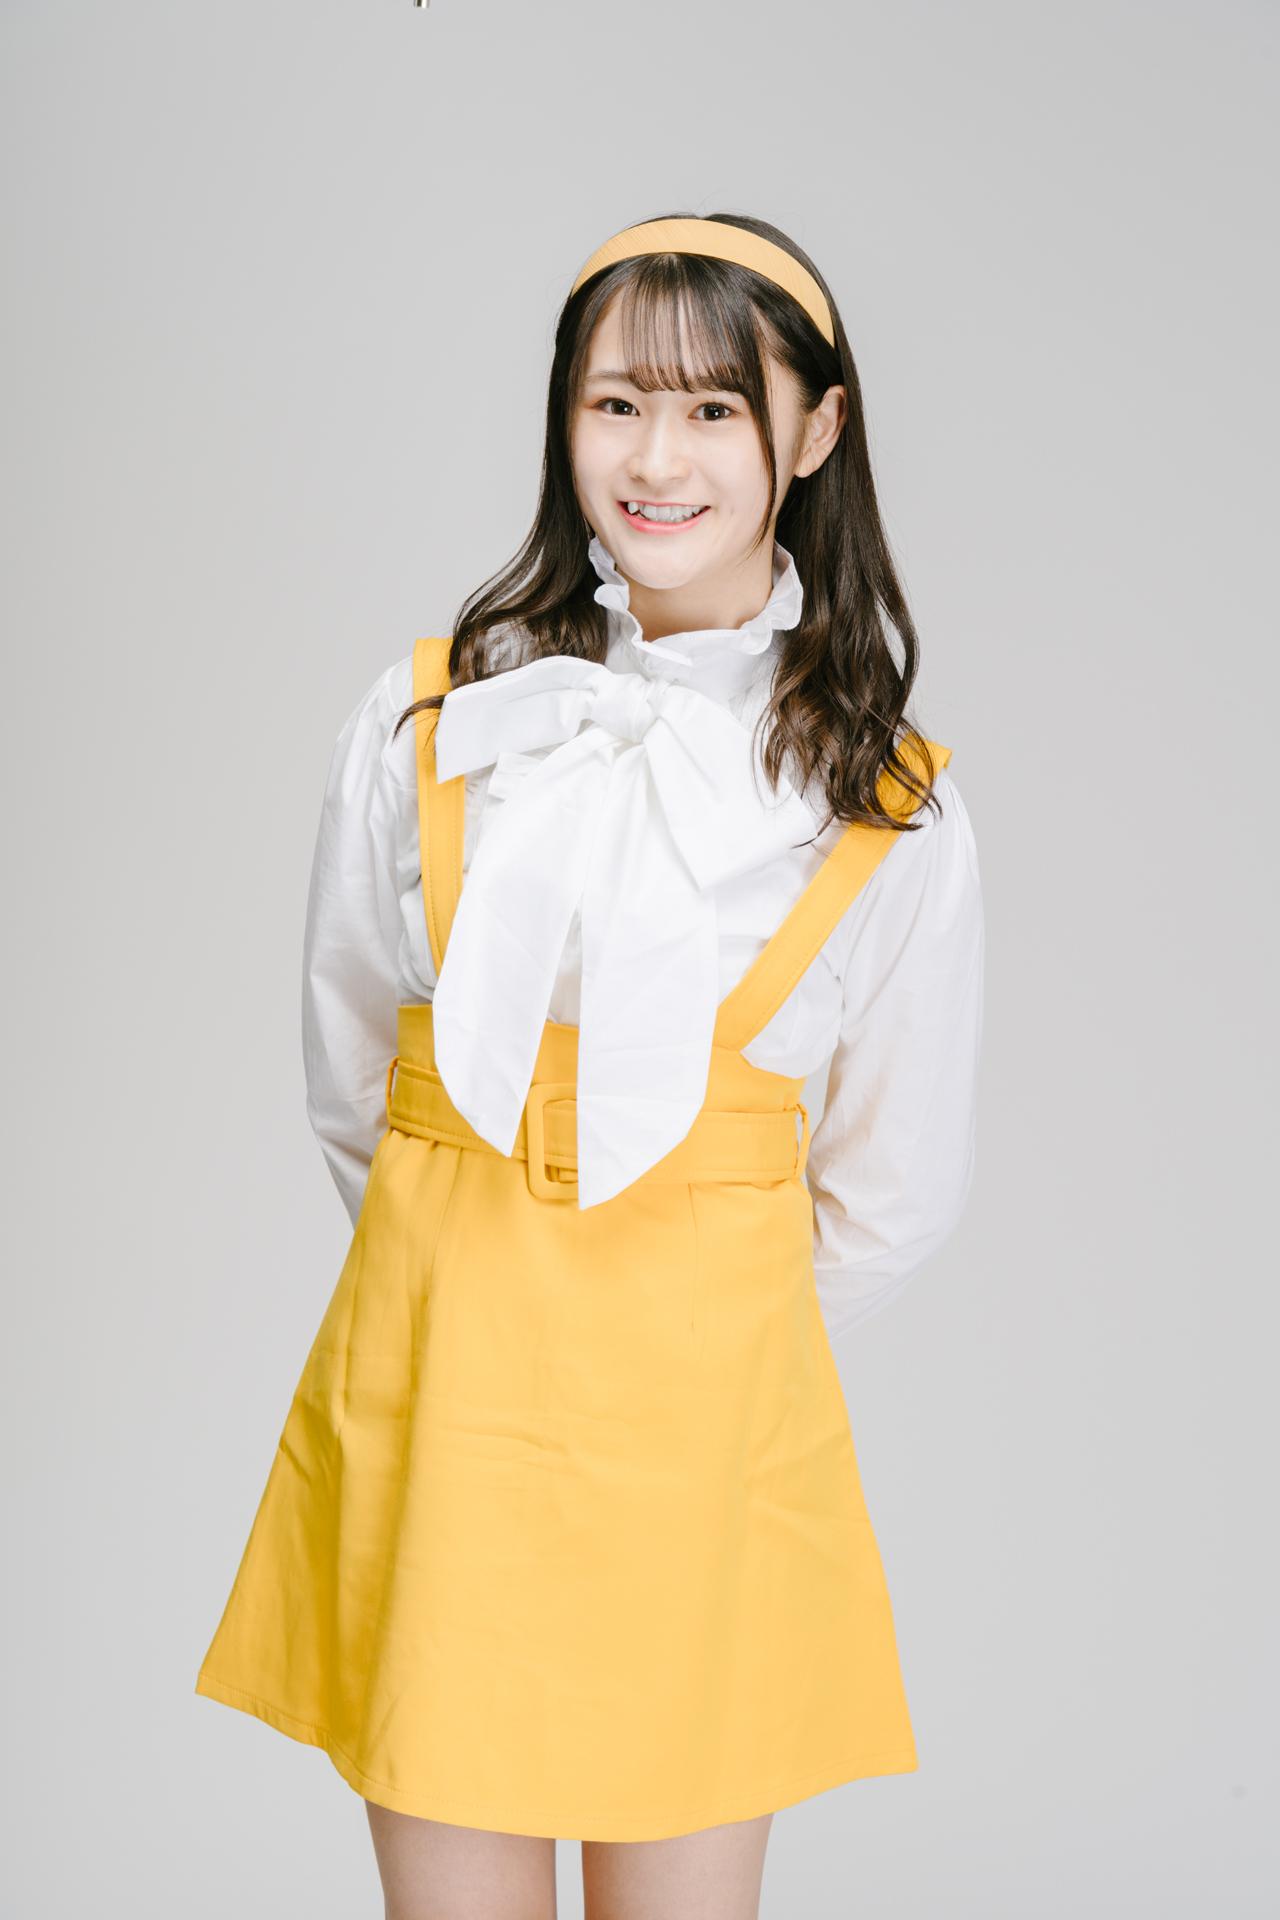 【Rene】1/16(土)オンライントーク特典会【ROSARIO+CROSS】